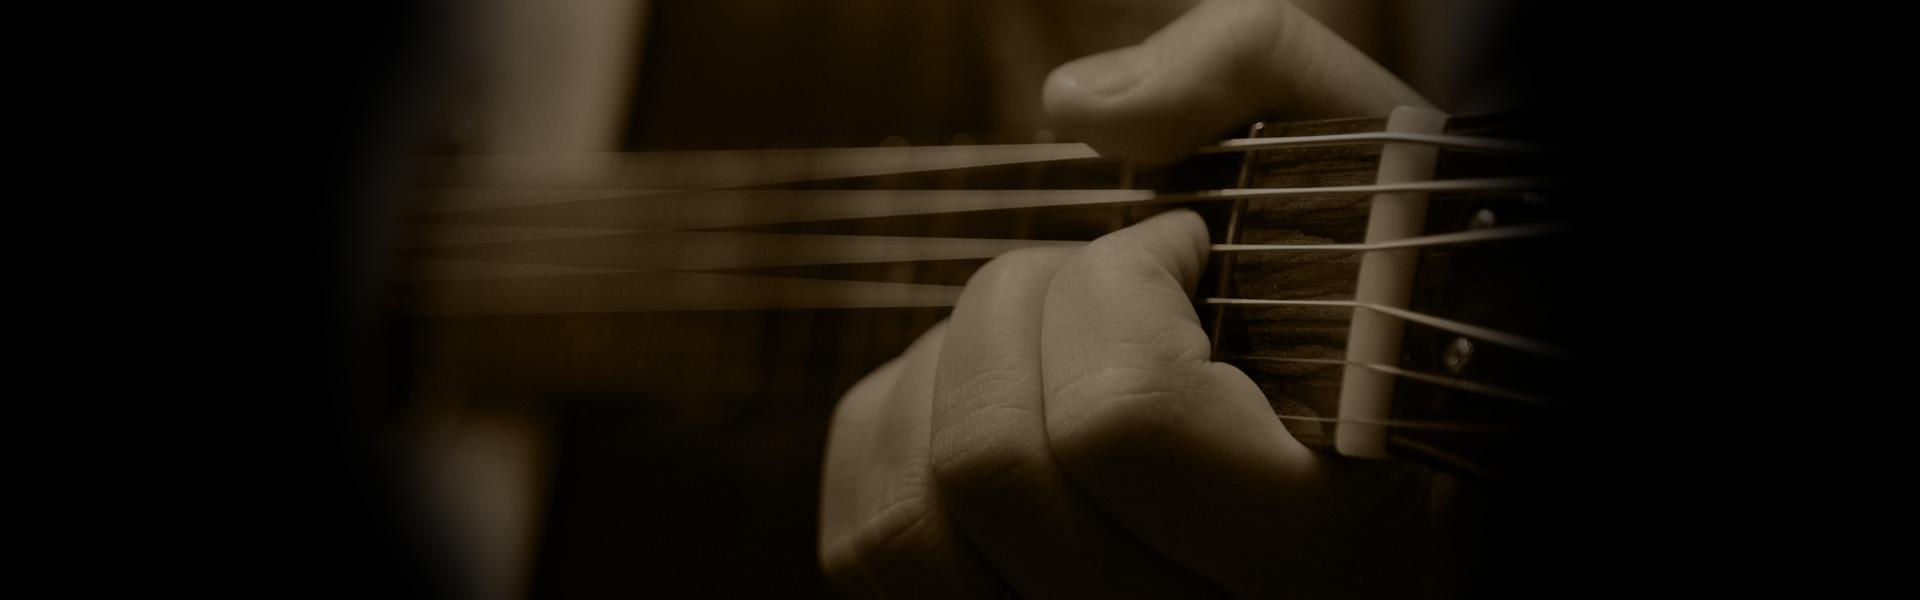 slider_bacground_guitar